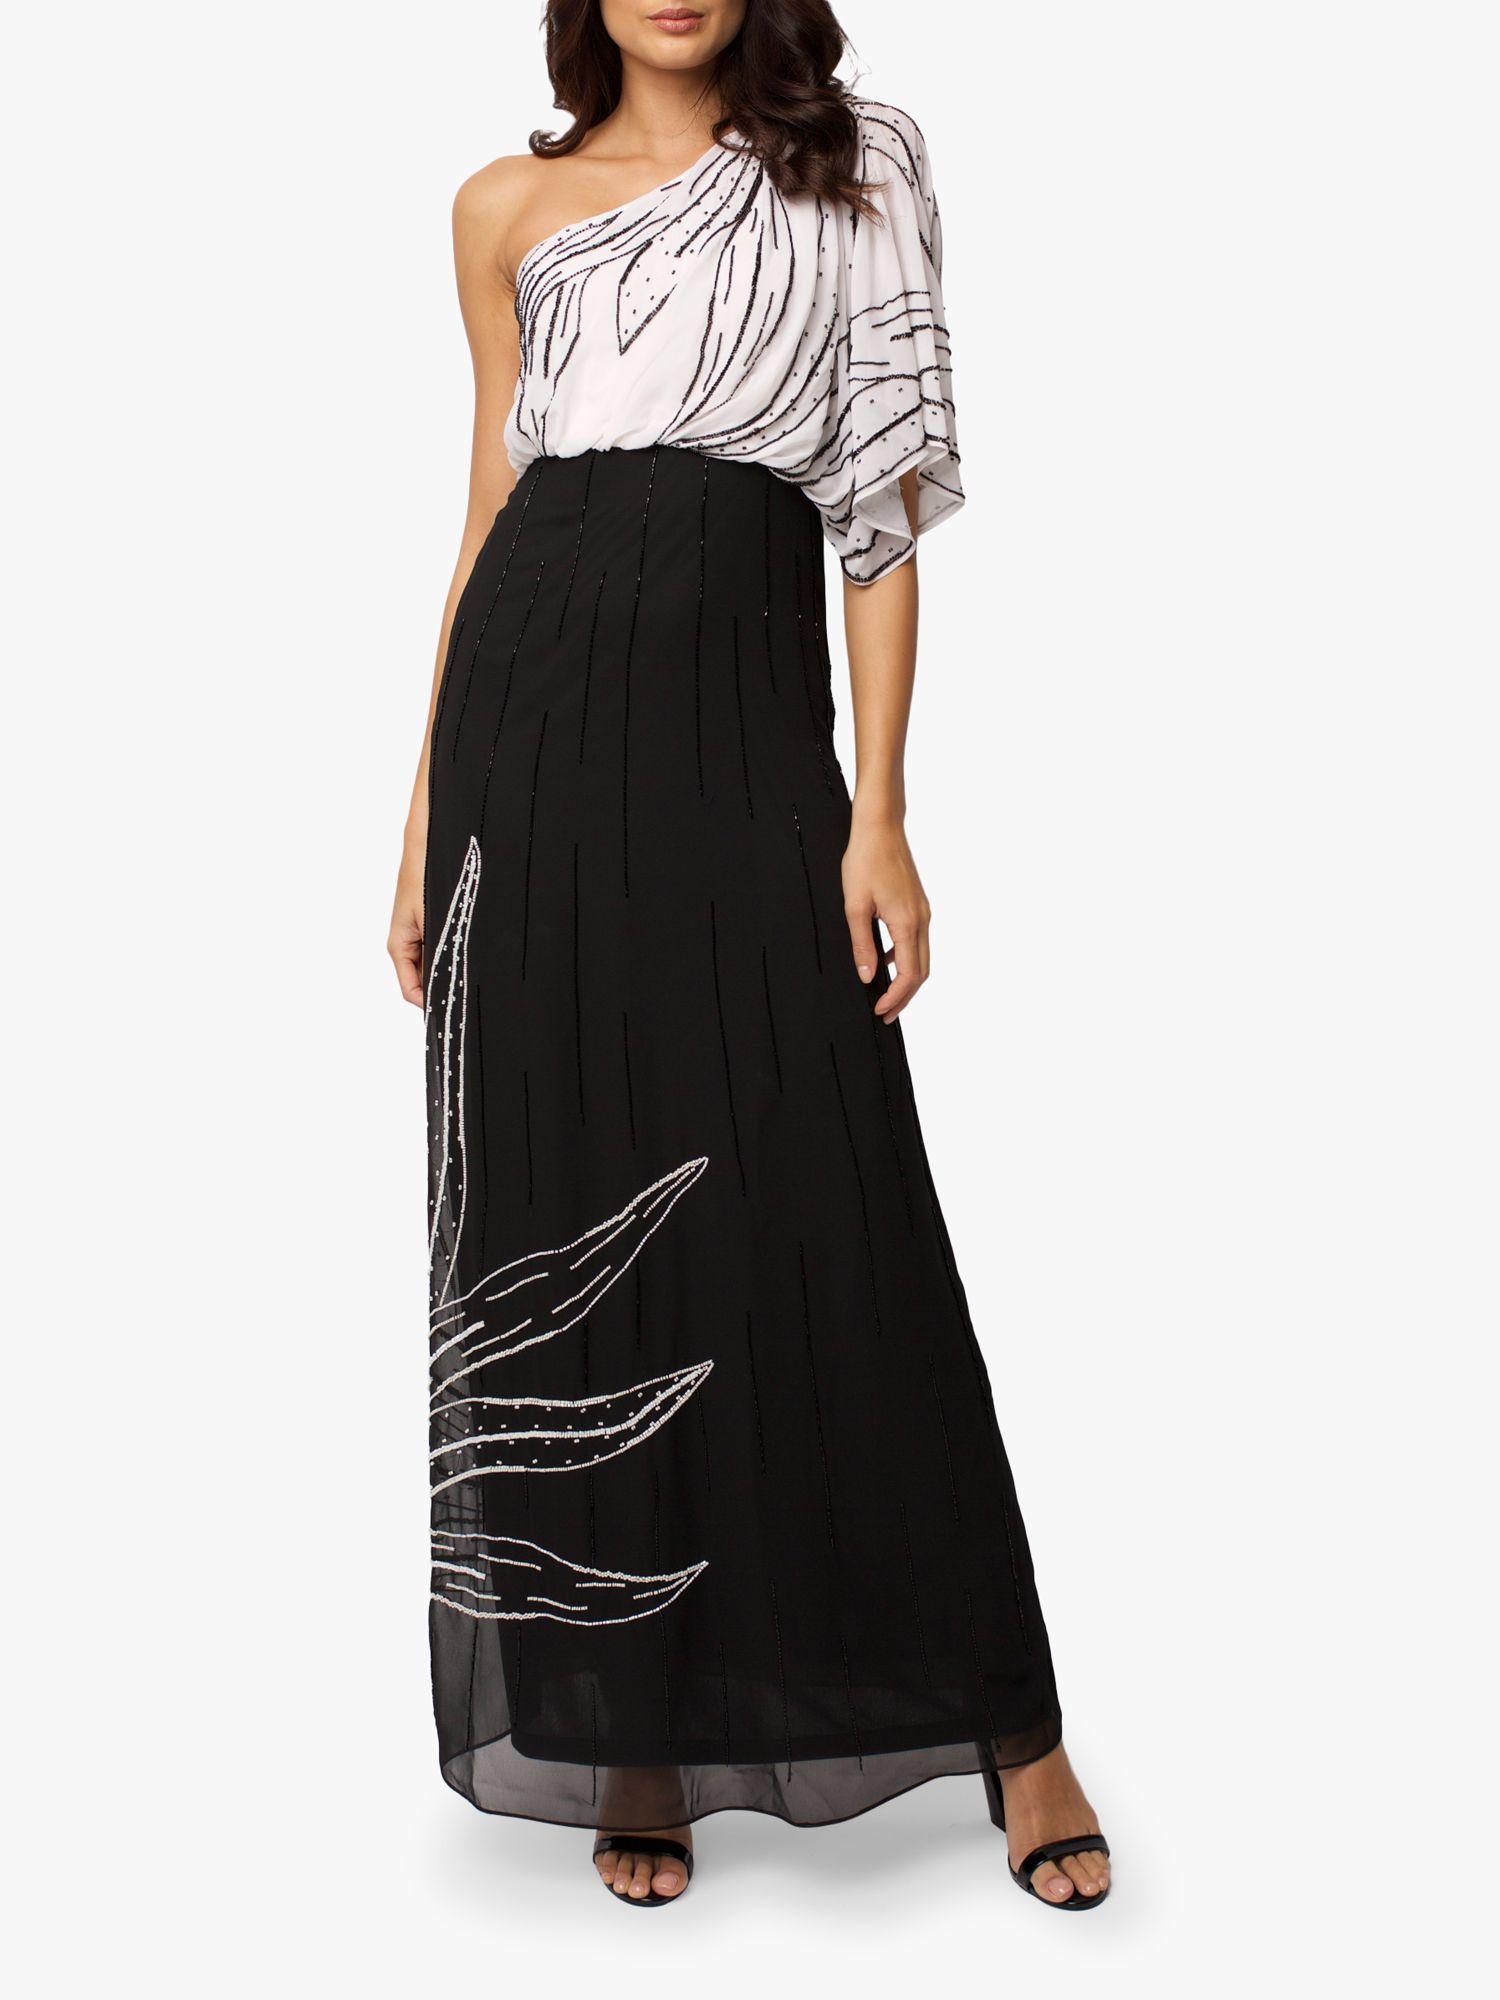 RAISHMA Raishma Meghan Monocharome Gown, Black/White